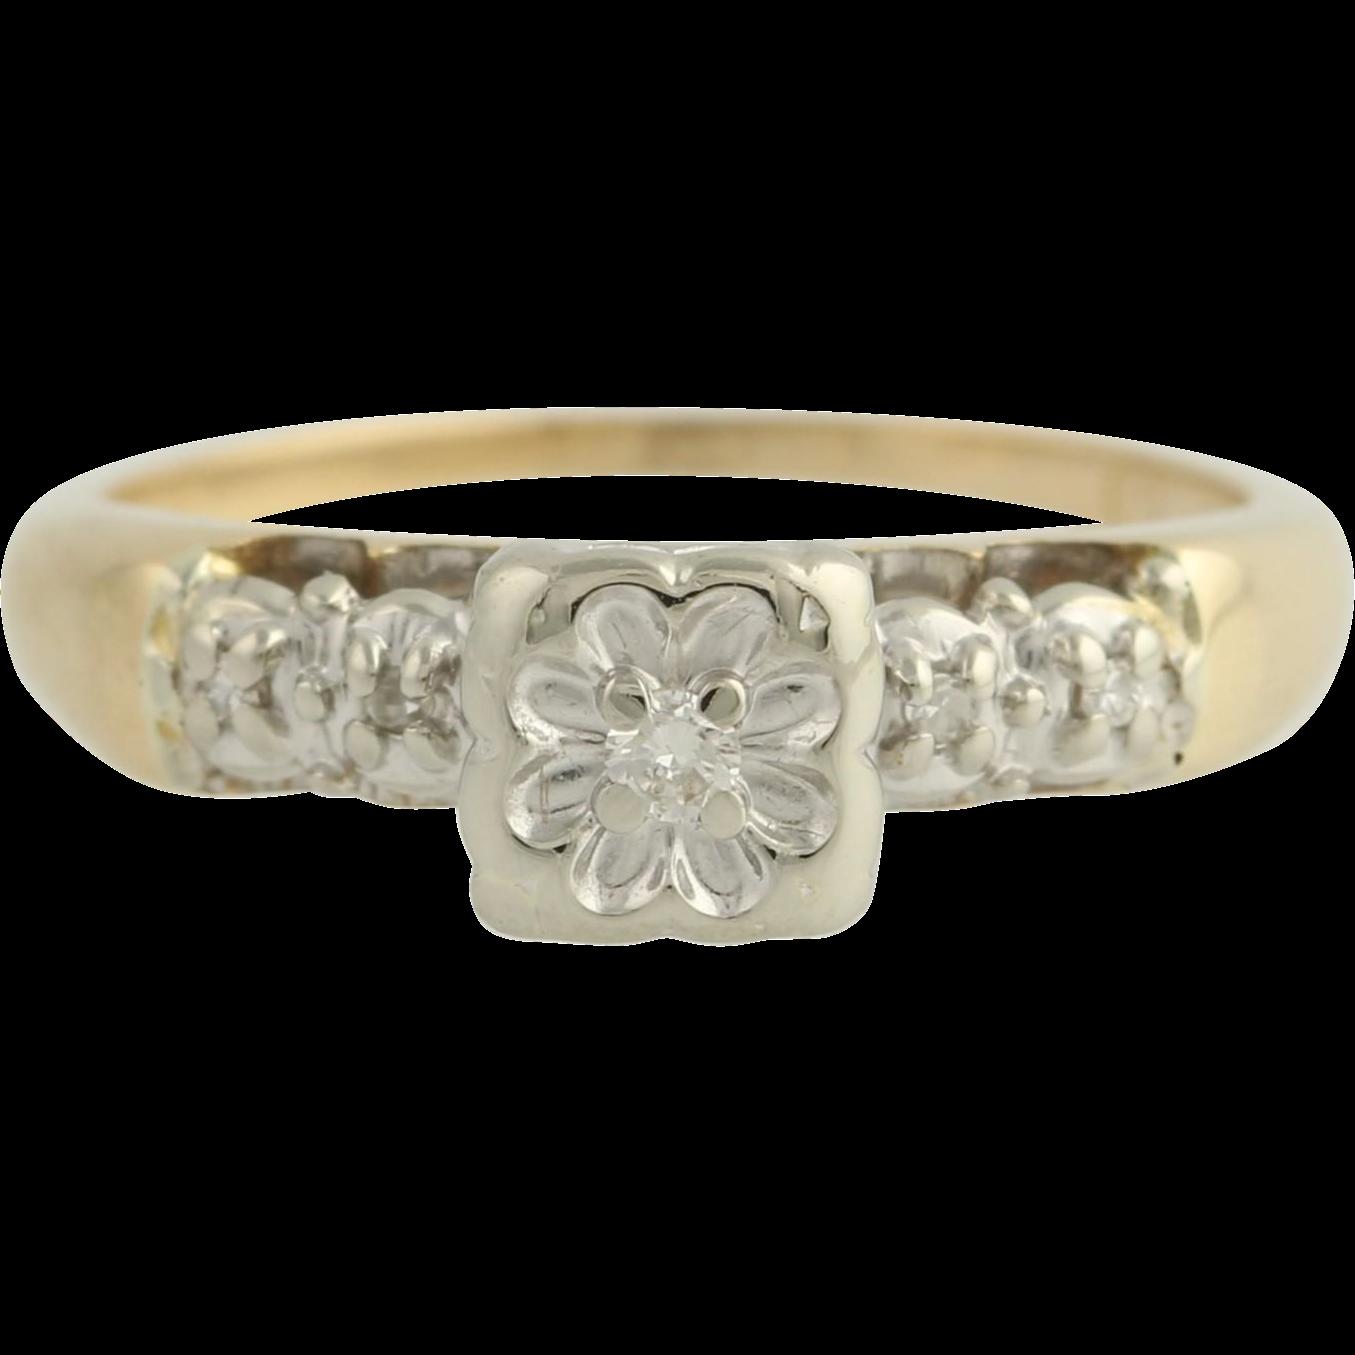 Vintage Diamond Ring - 14k Yellow Gold Band Women's Fine Estate Size 6 Promise